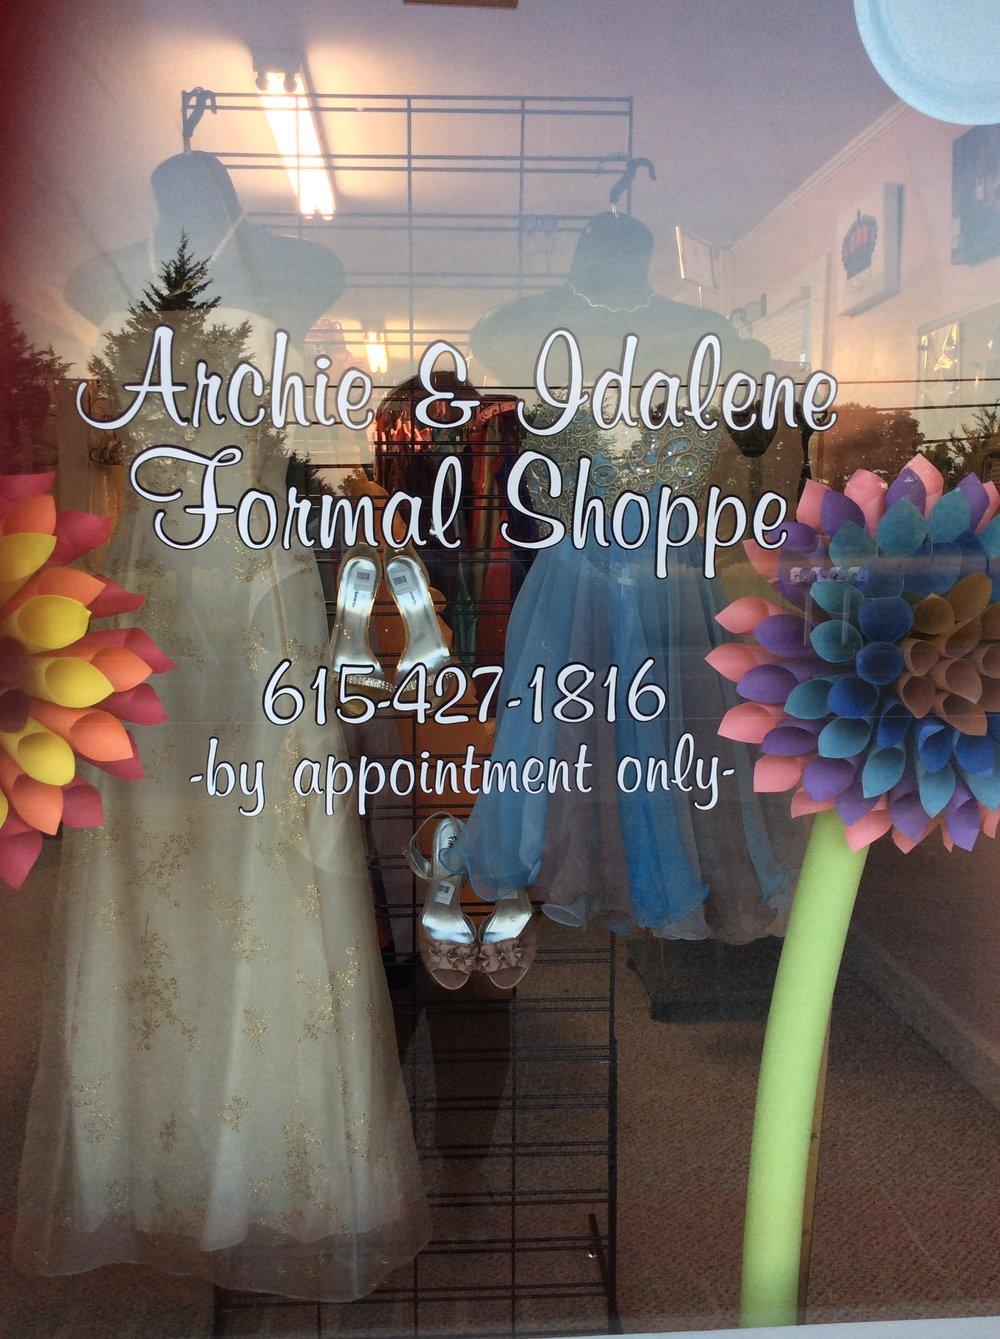 archie & idalene Formal Shoppe